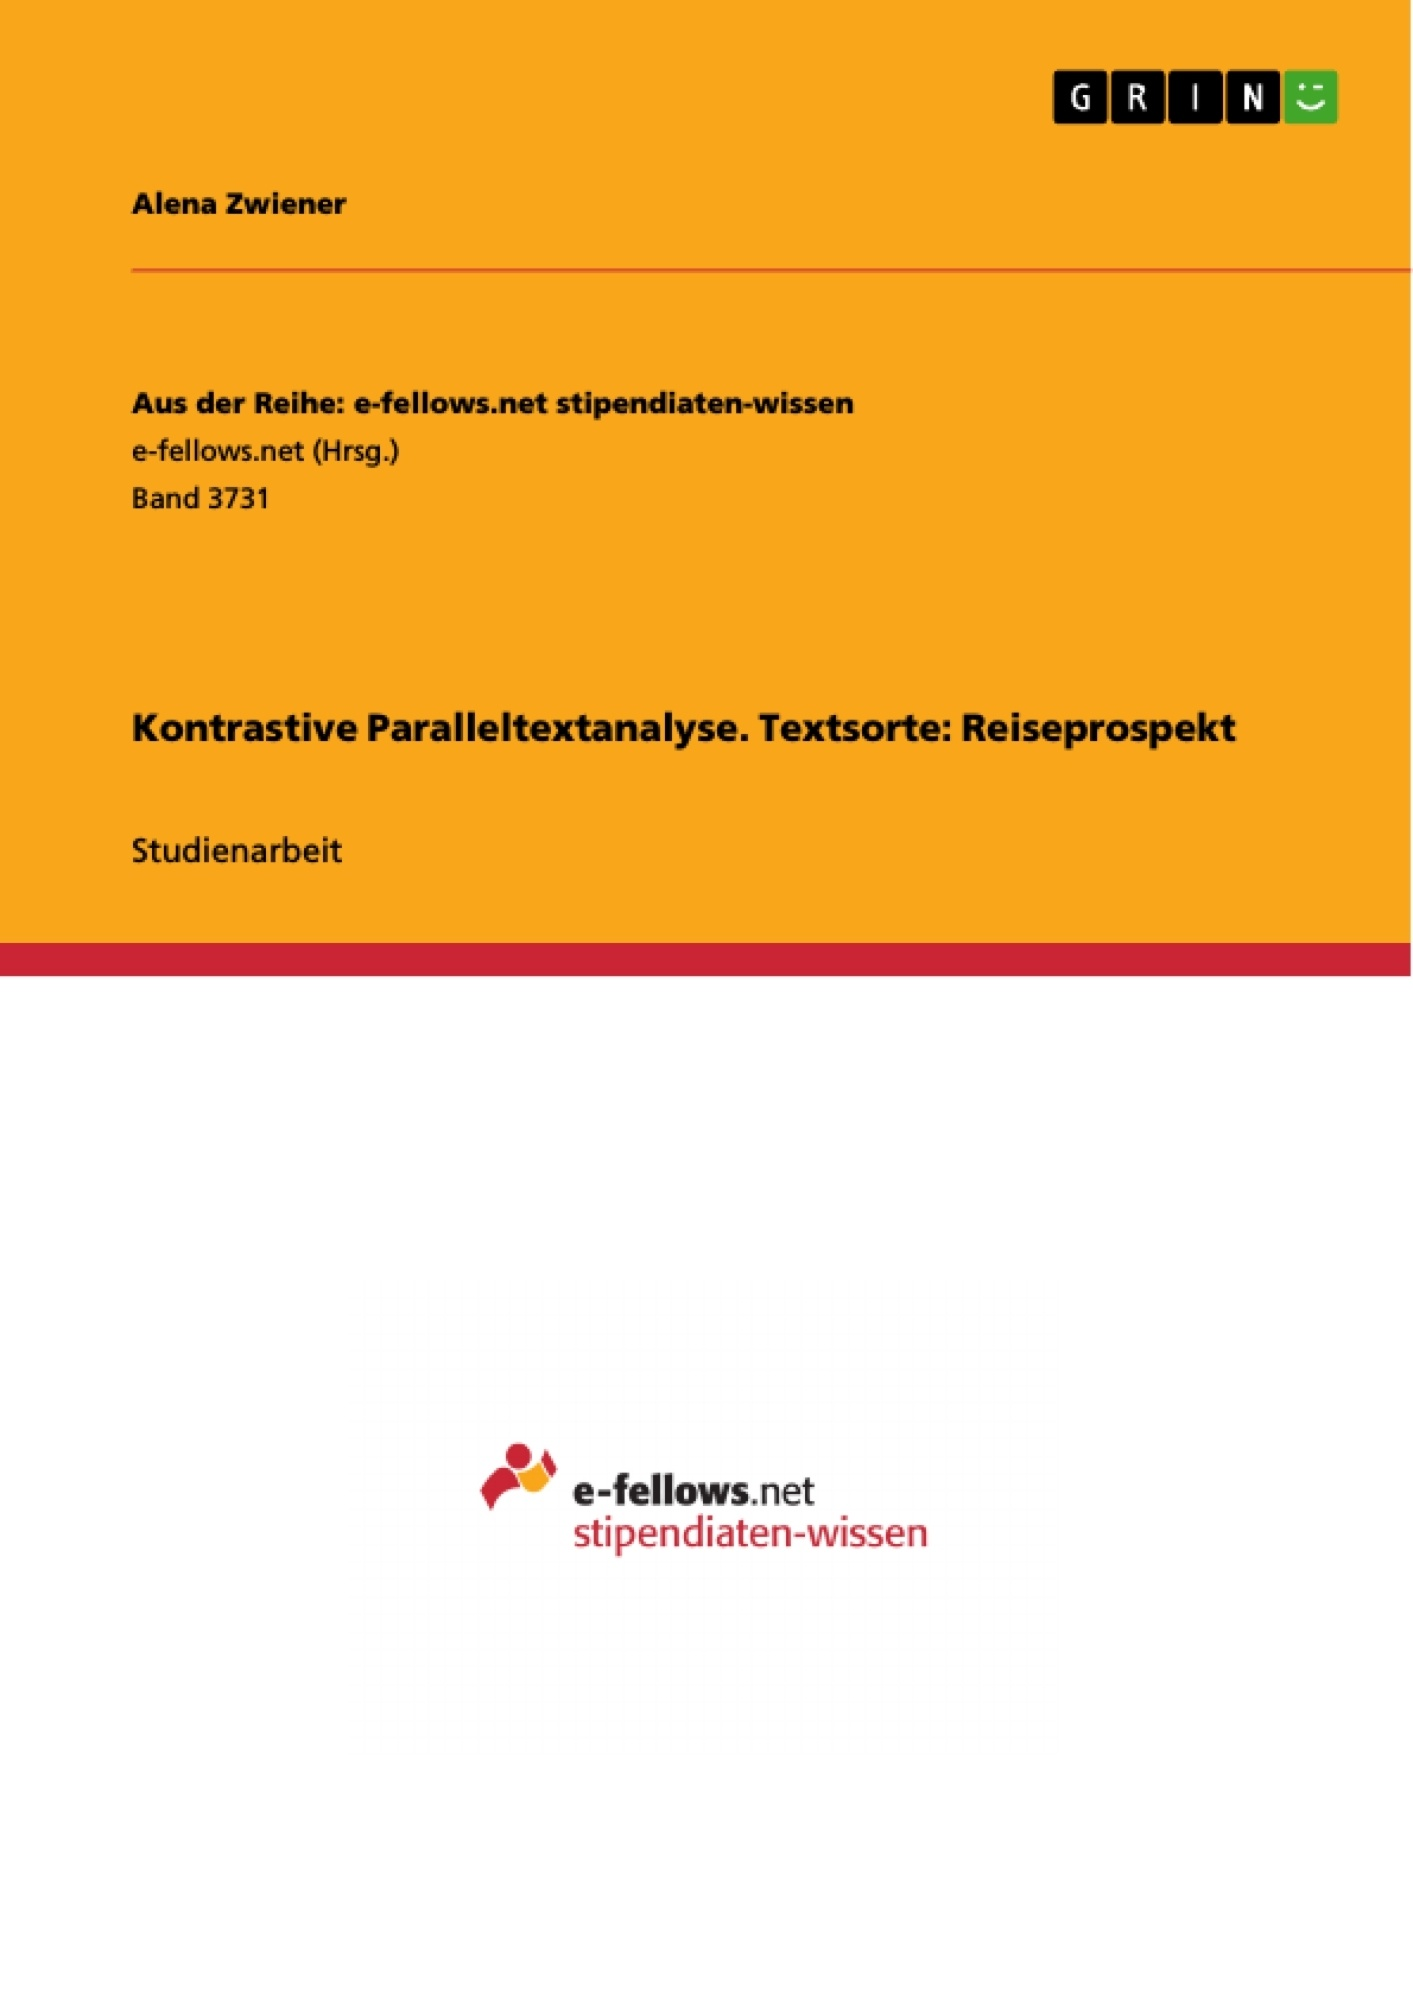 Titel: Kontrastive Paralleltextanalyse. Textsorte: Reiseprospekt